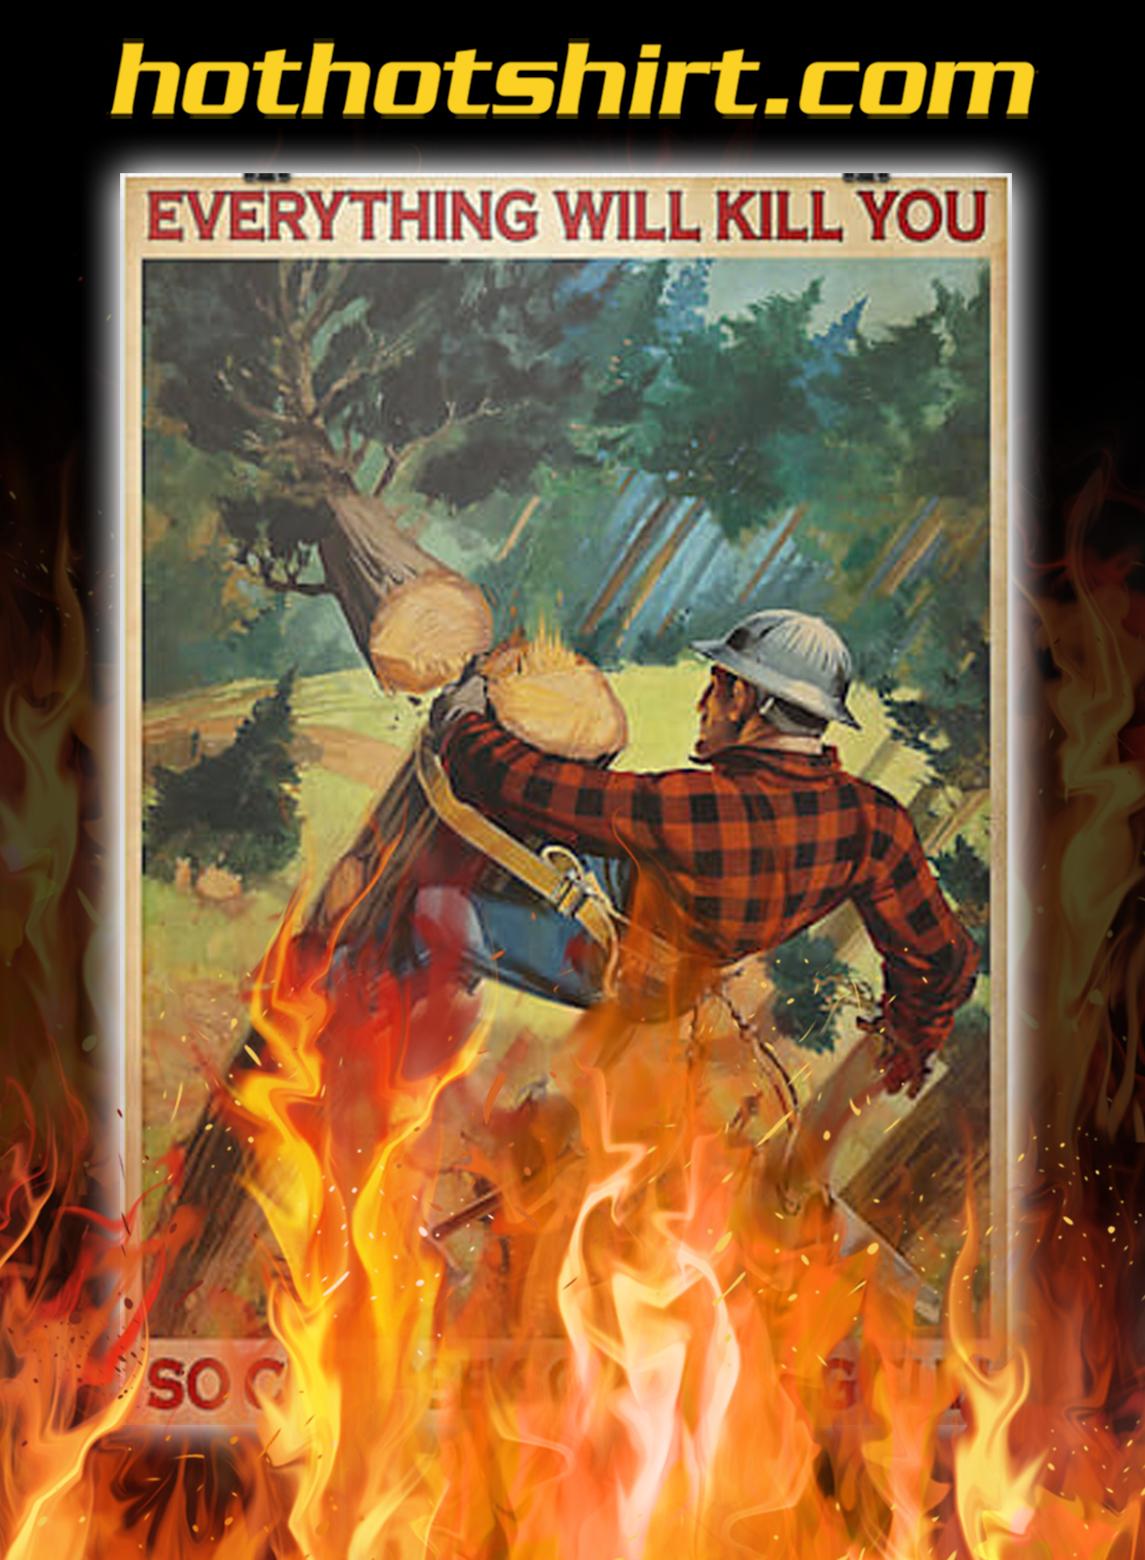 Lumberman everything will kill you so choose something fun poster - A2